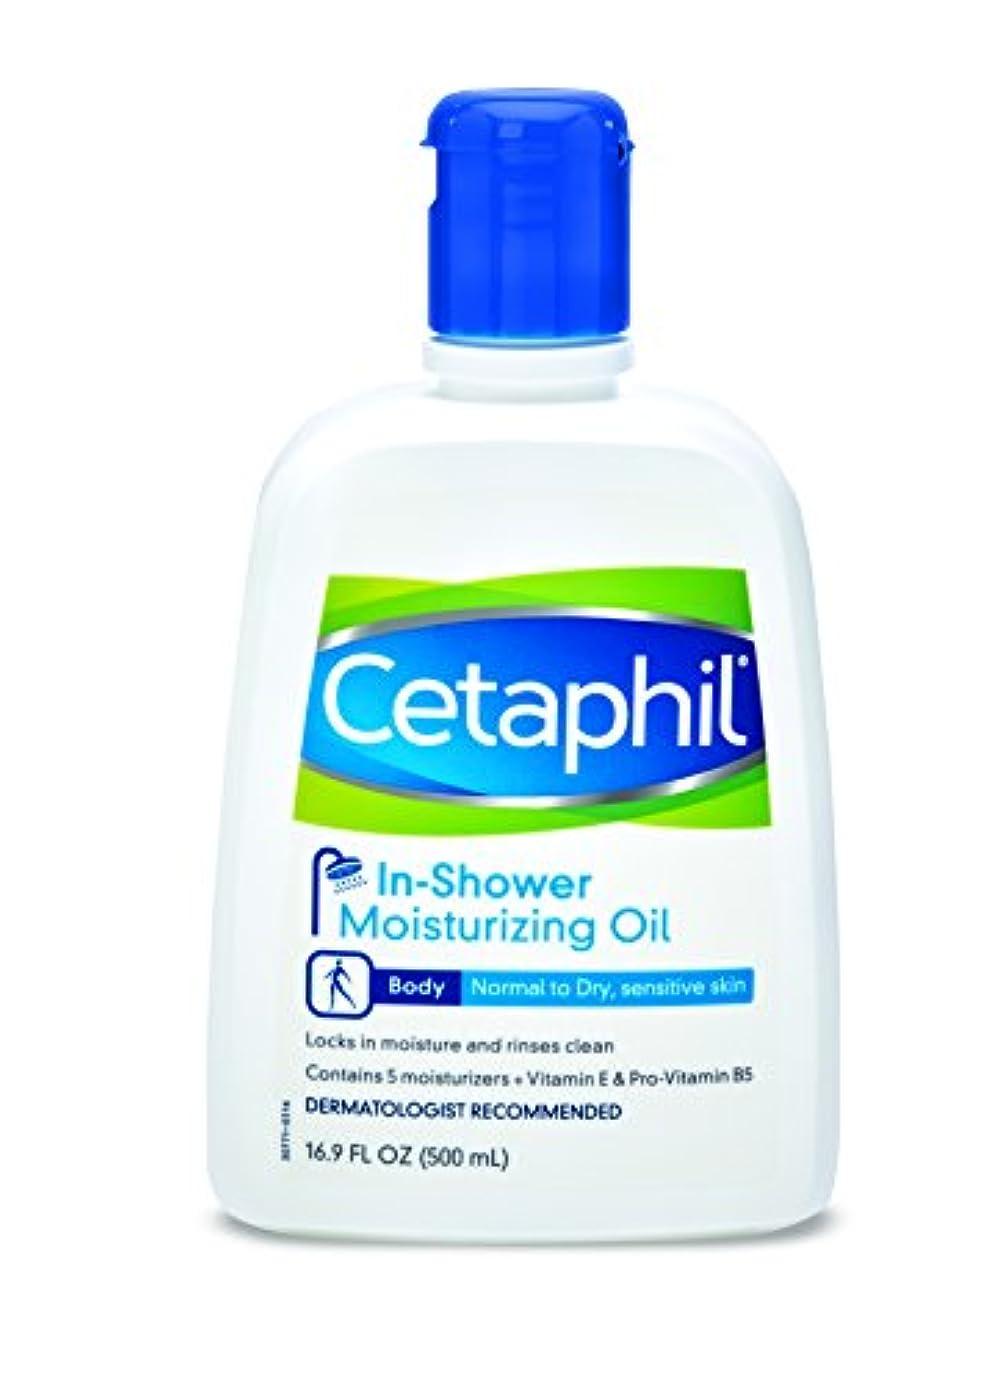 Cetaphil 通常からドライ用のインシャワー保湿オイル、Sensativeスキン、16.9オンス